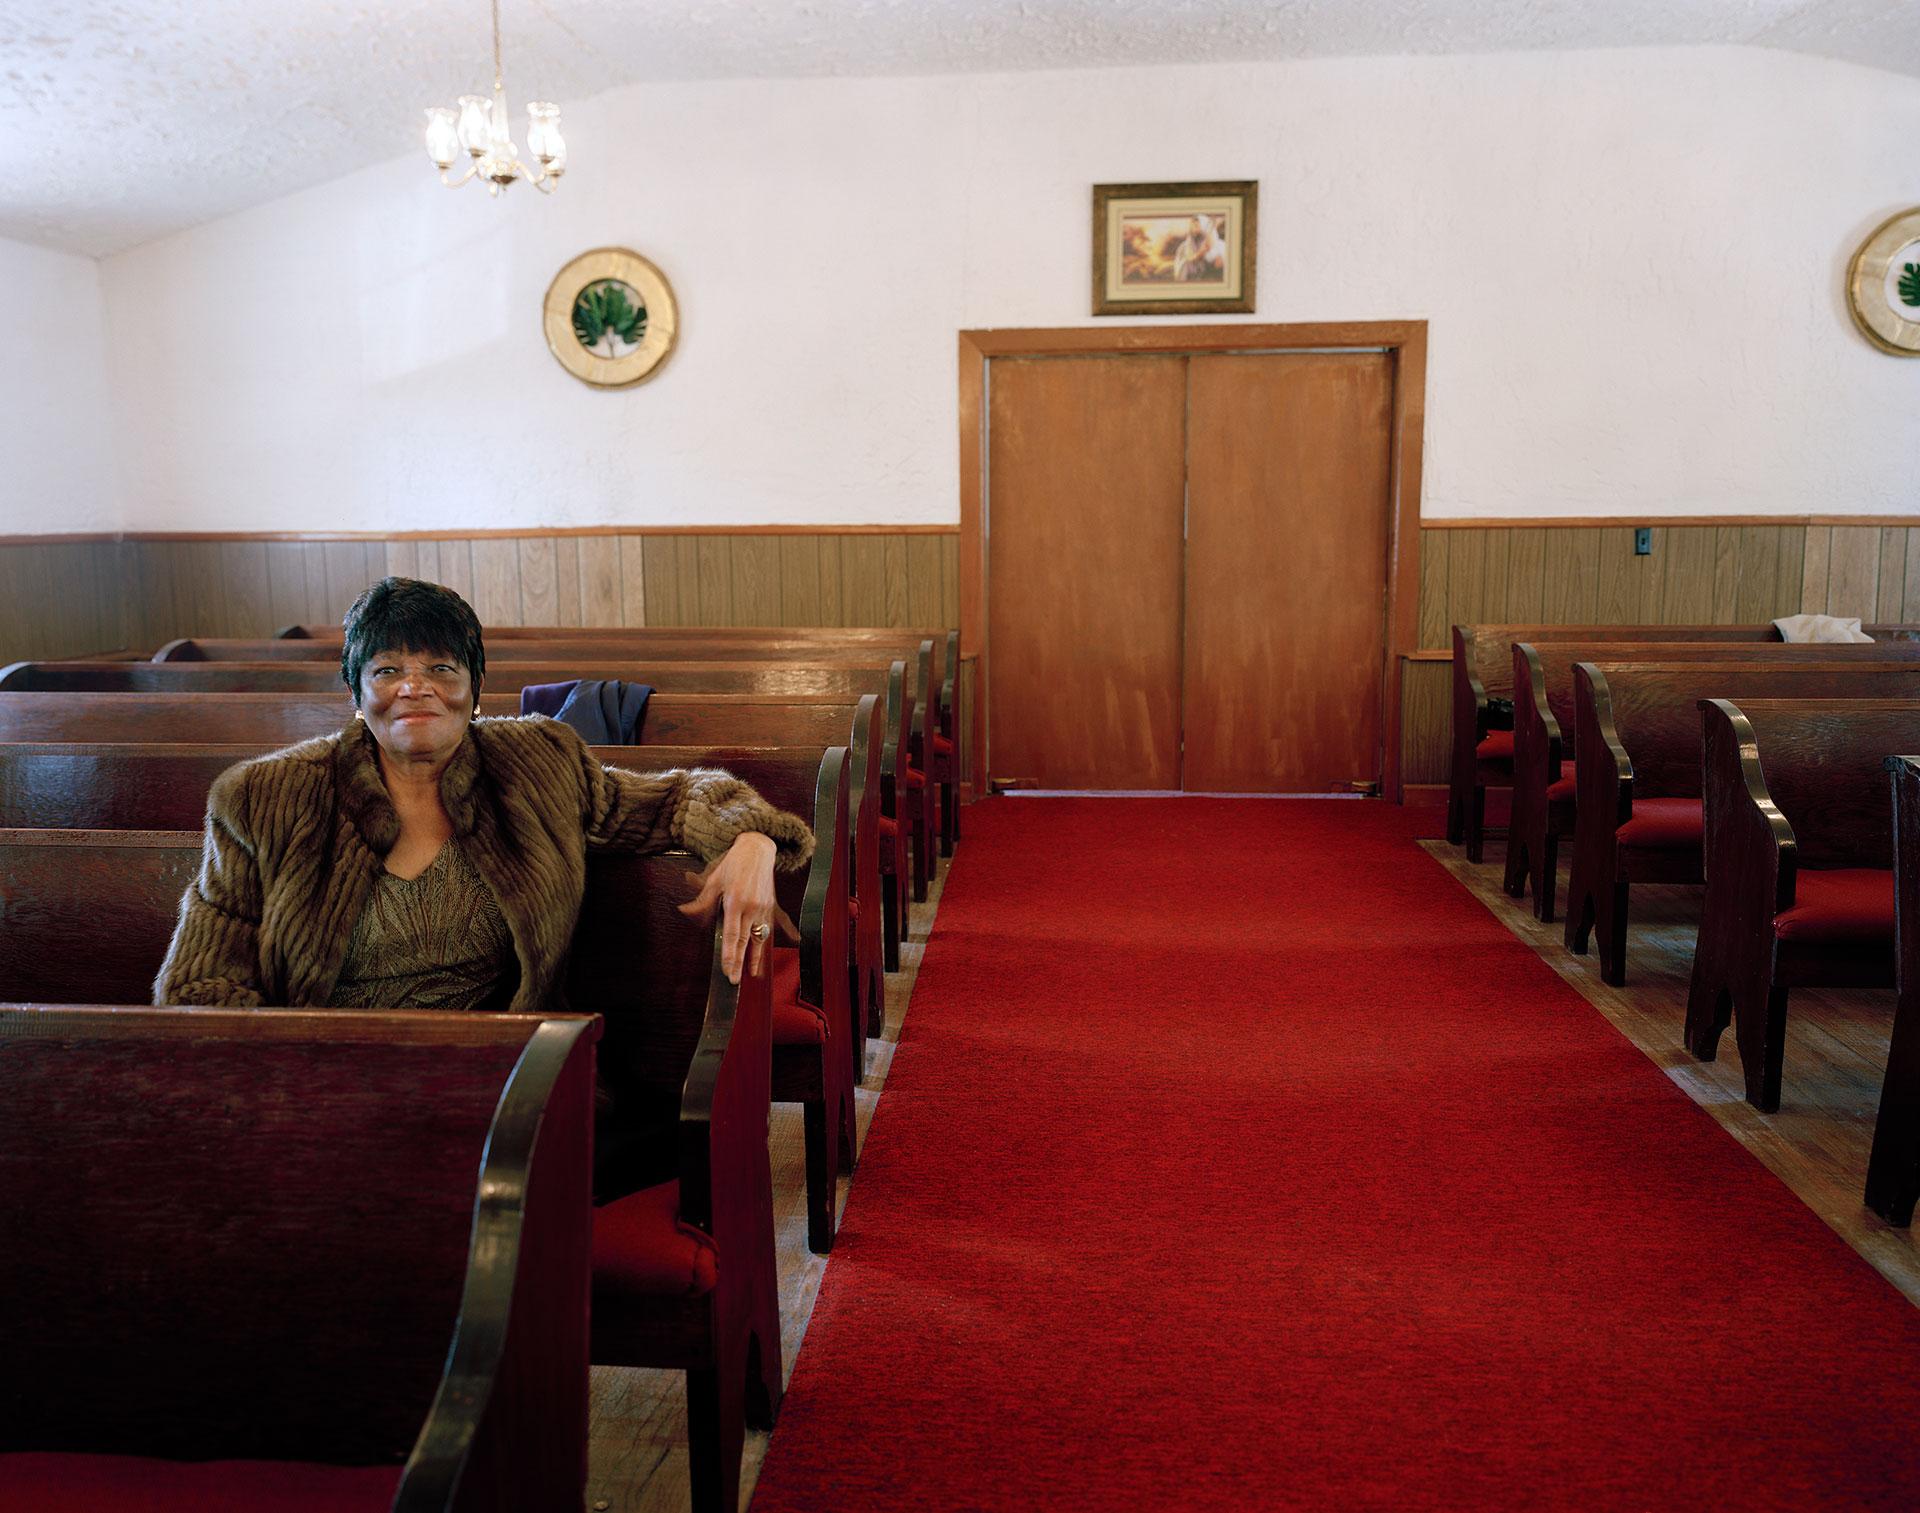 Thelma on Valentine's Day, Antioch Baptist Church, Highway 64